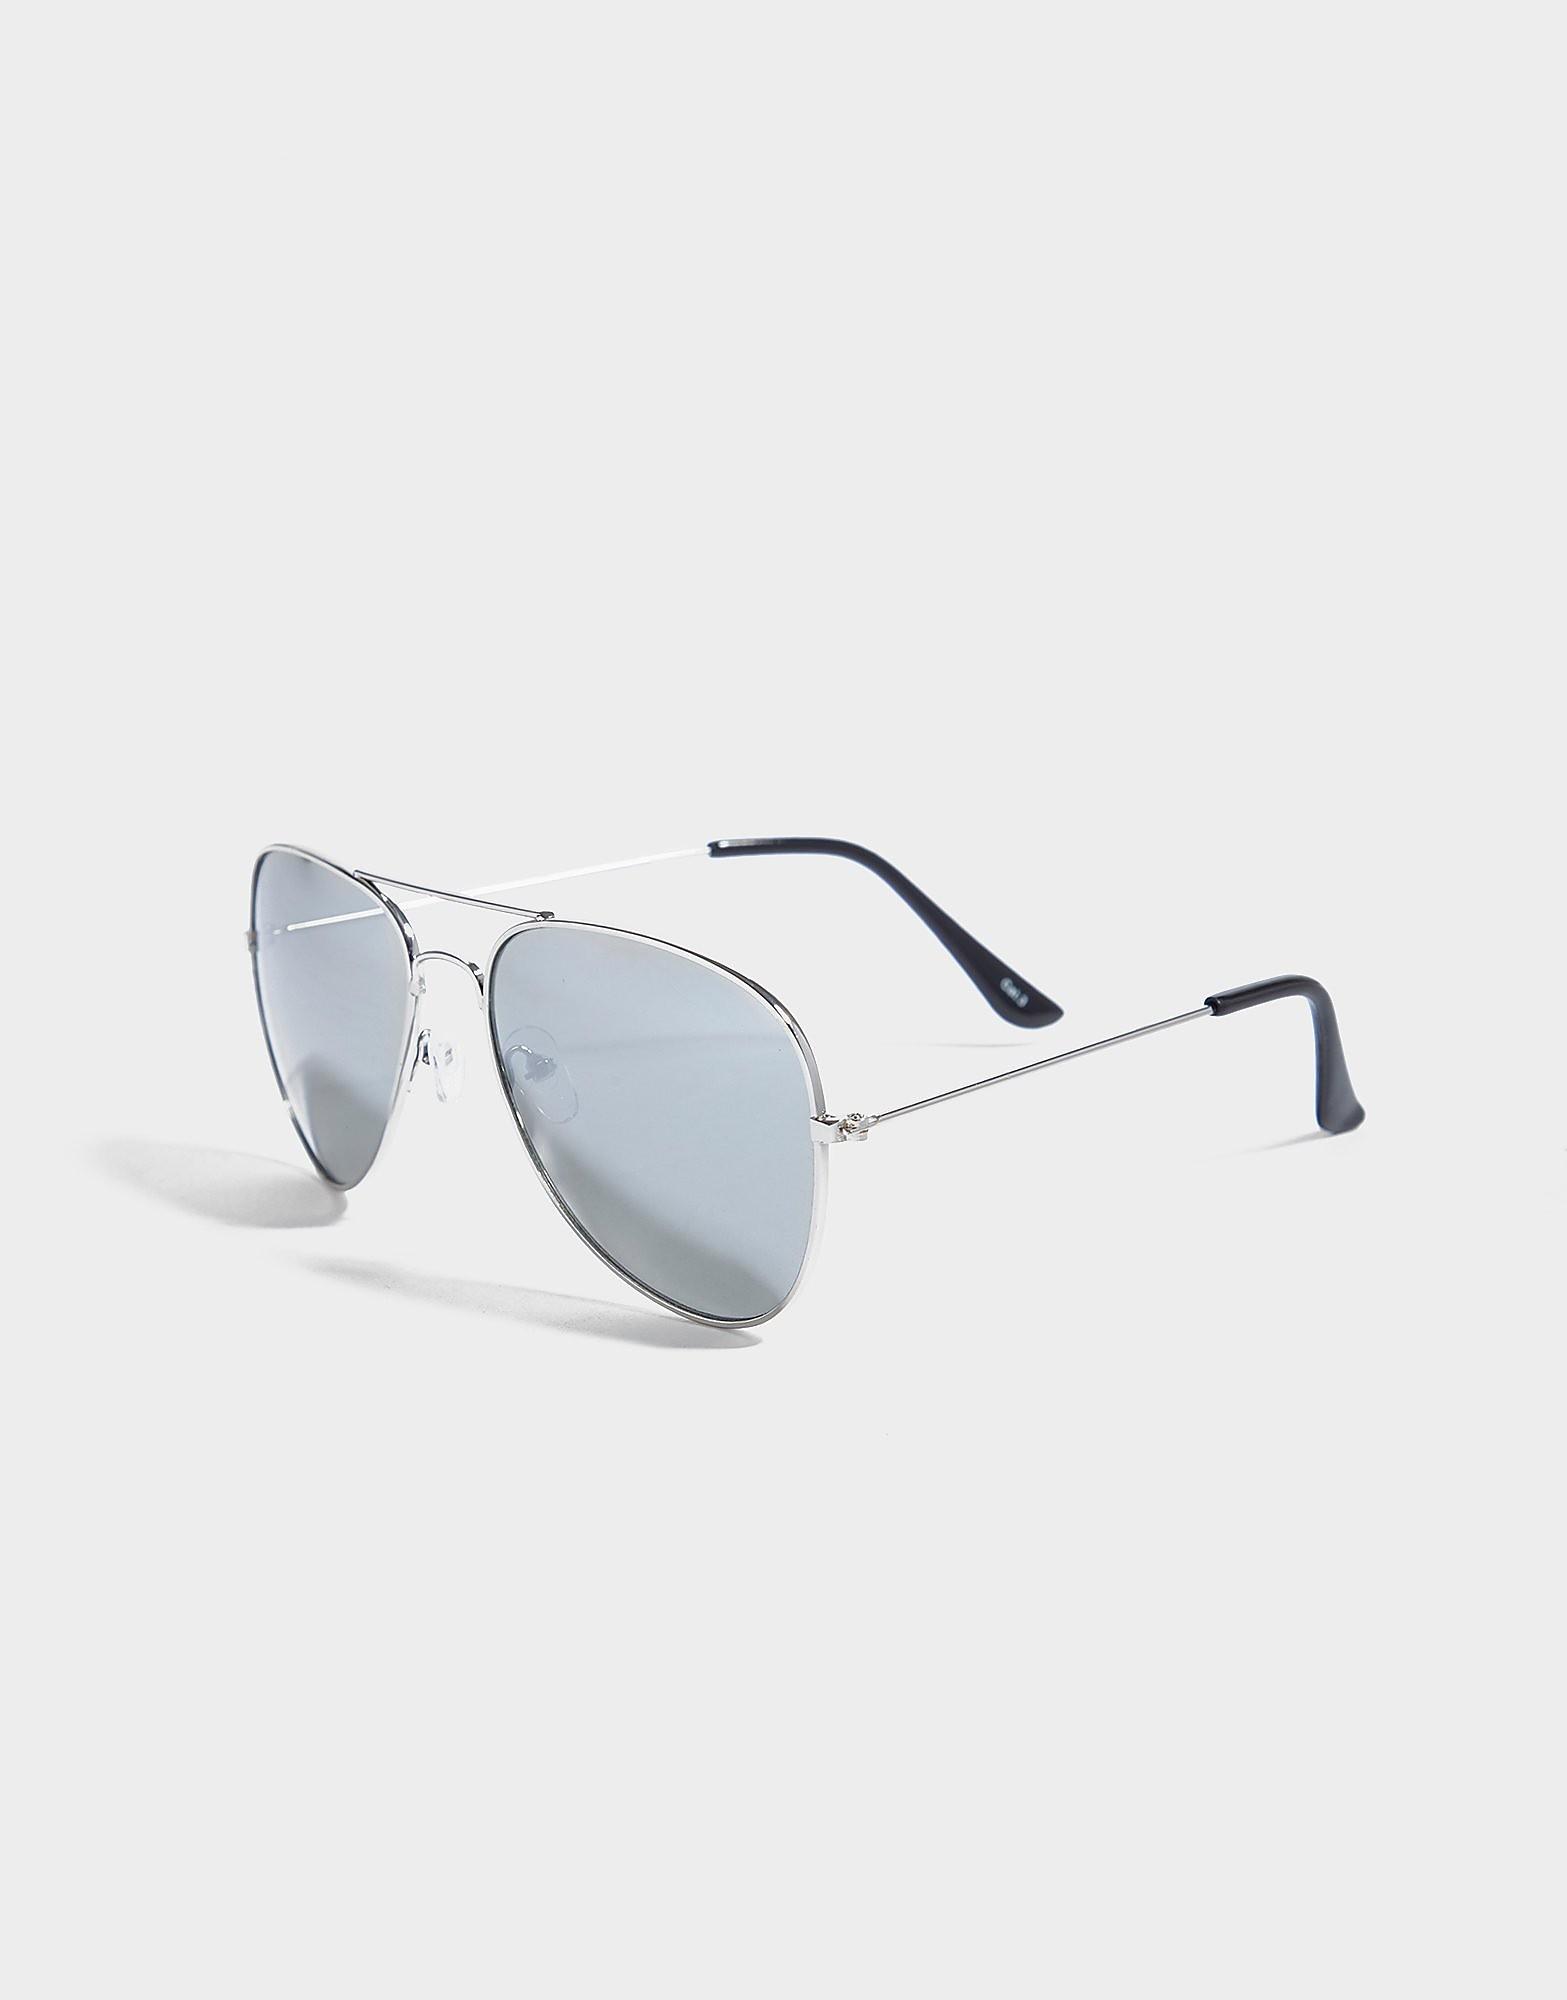 Brookhaven Francis Mirrored Aviator Sunglasses